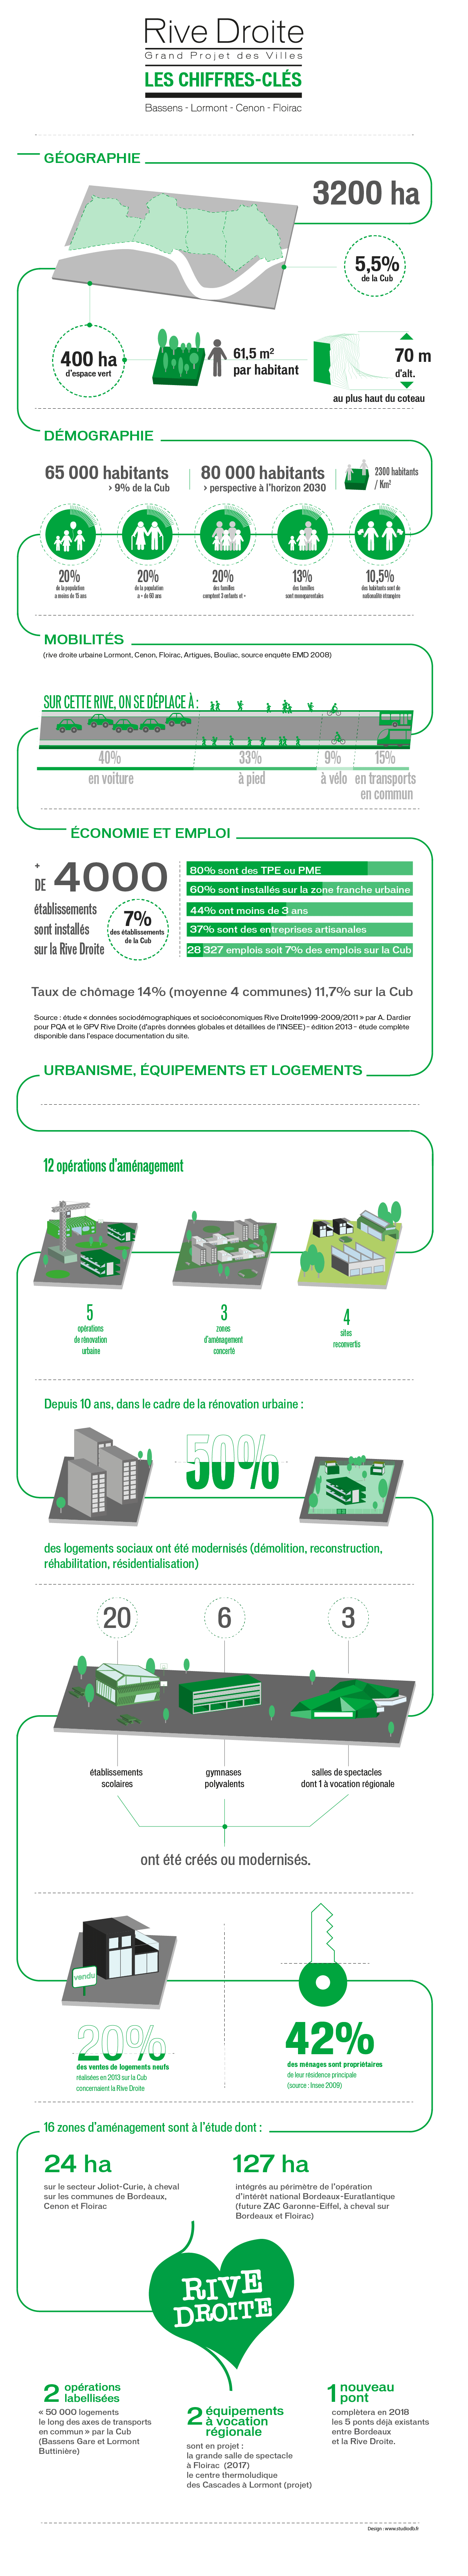 Gpv chiffres